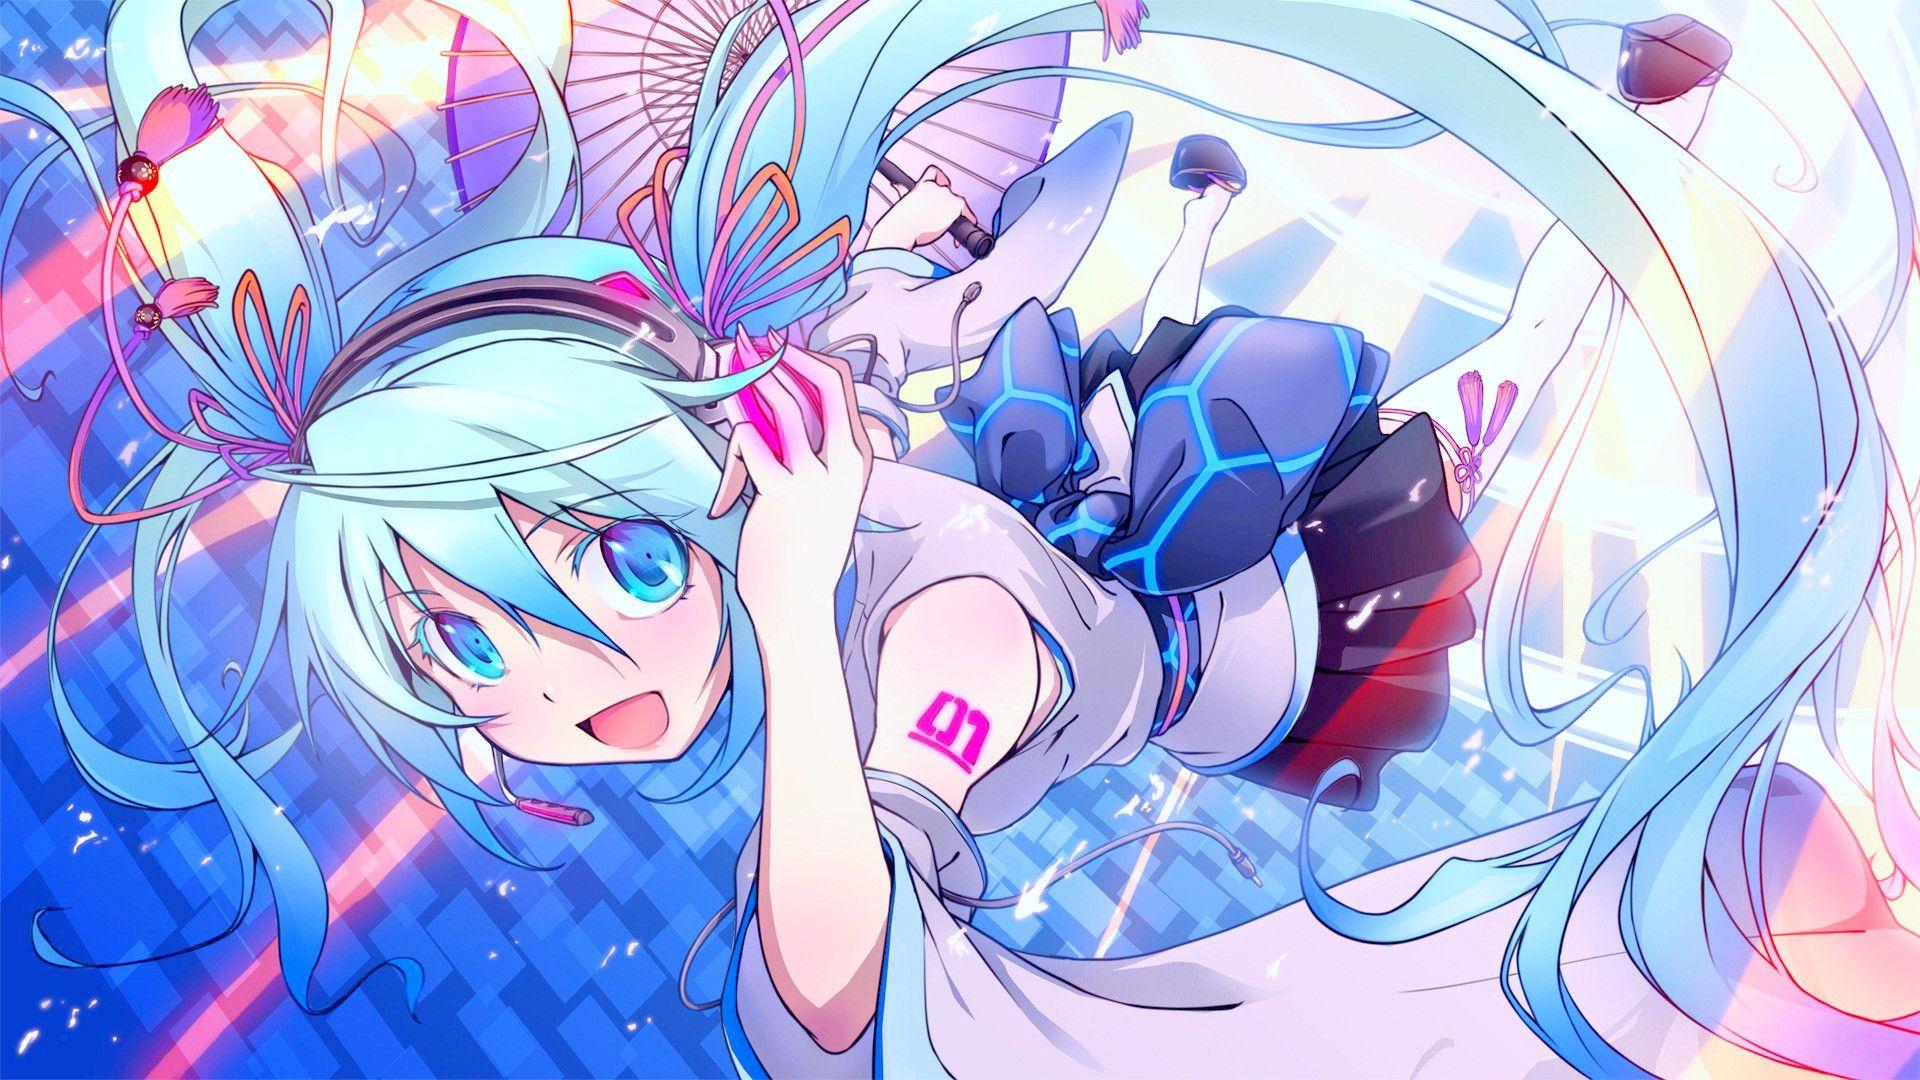 aqua, Hair, Blue, Eyes, Hatsune, Miku, Headphones, Long